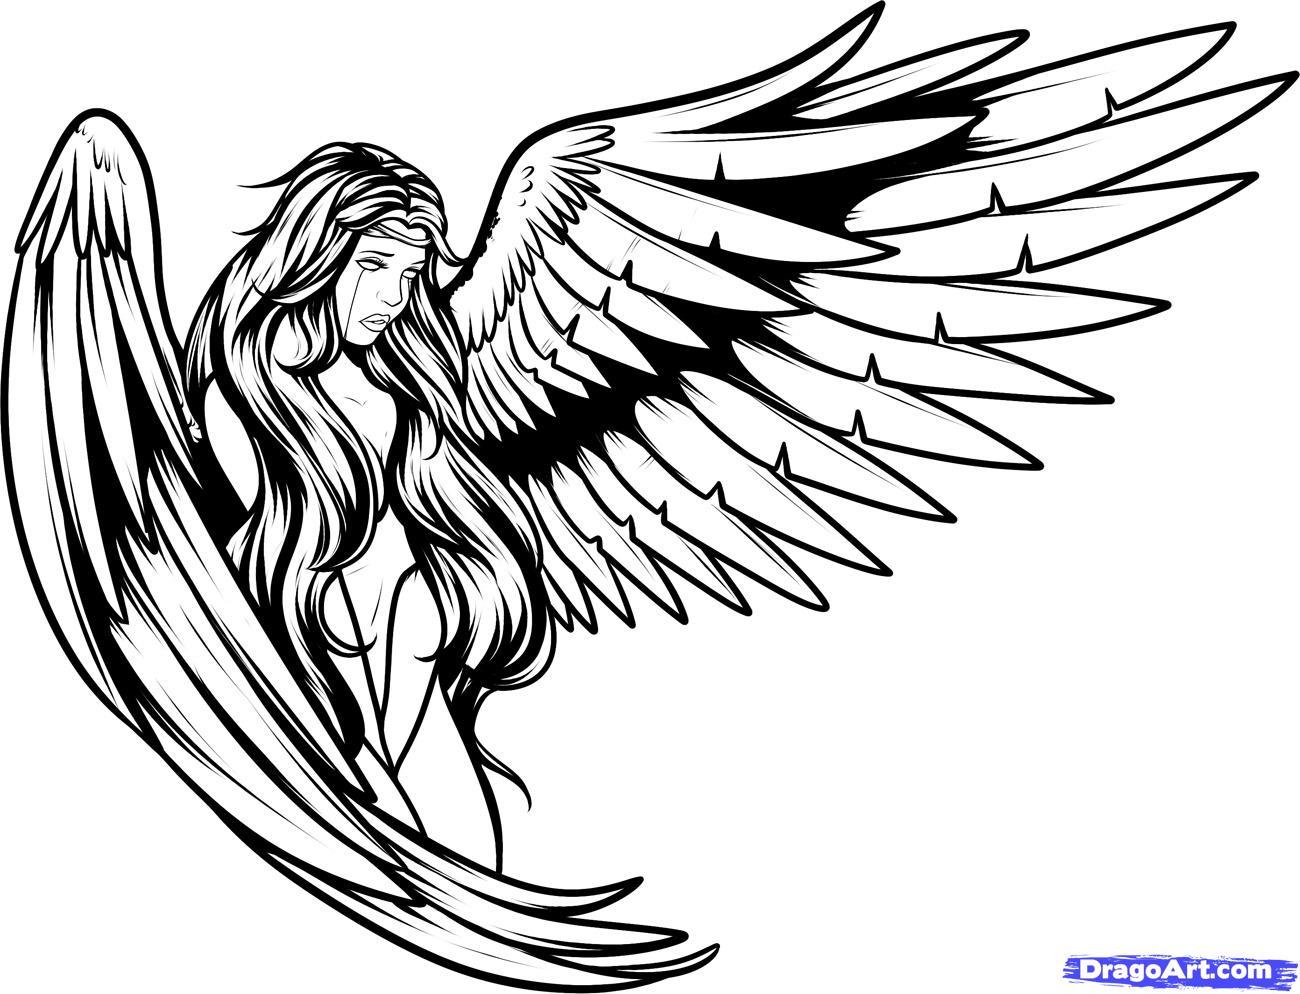 1300x994 Photos Angel Line Drawings,